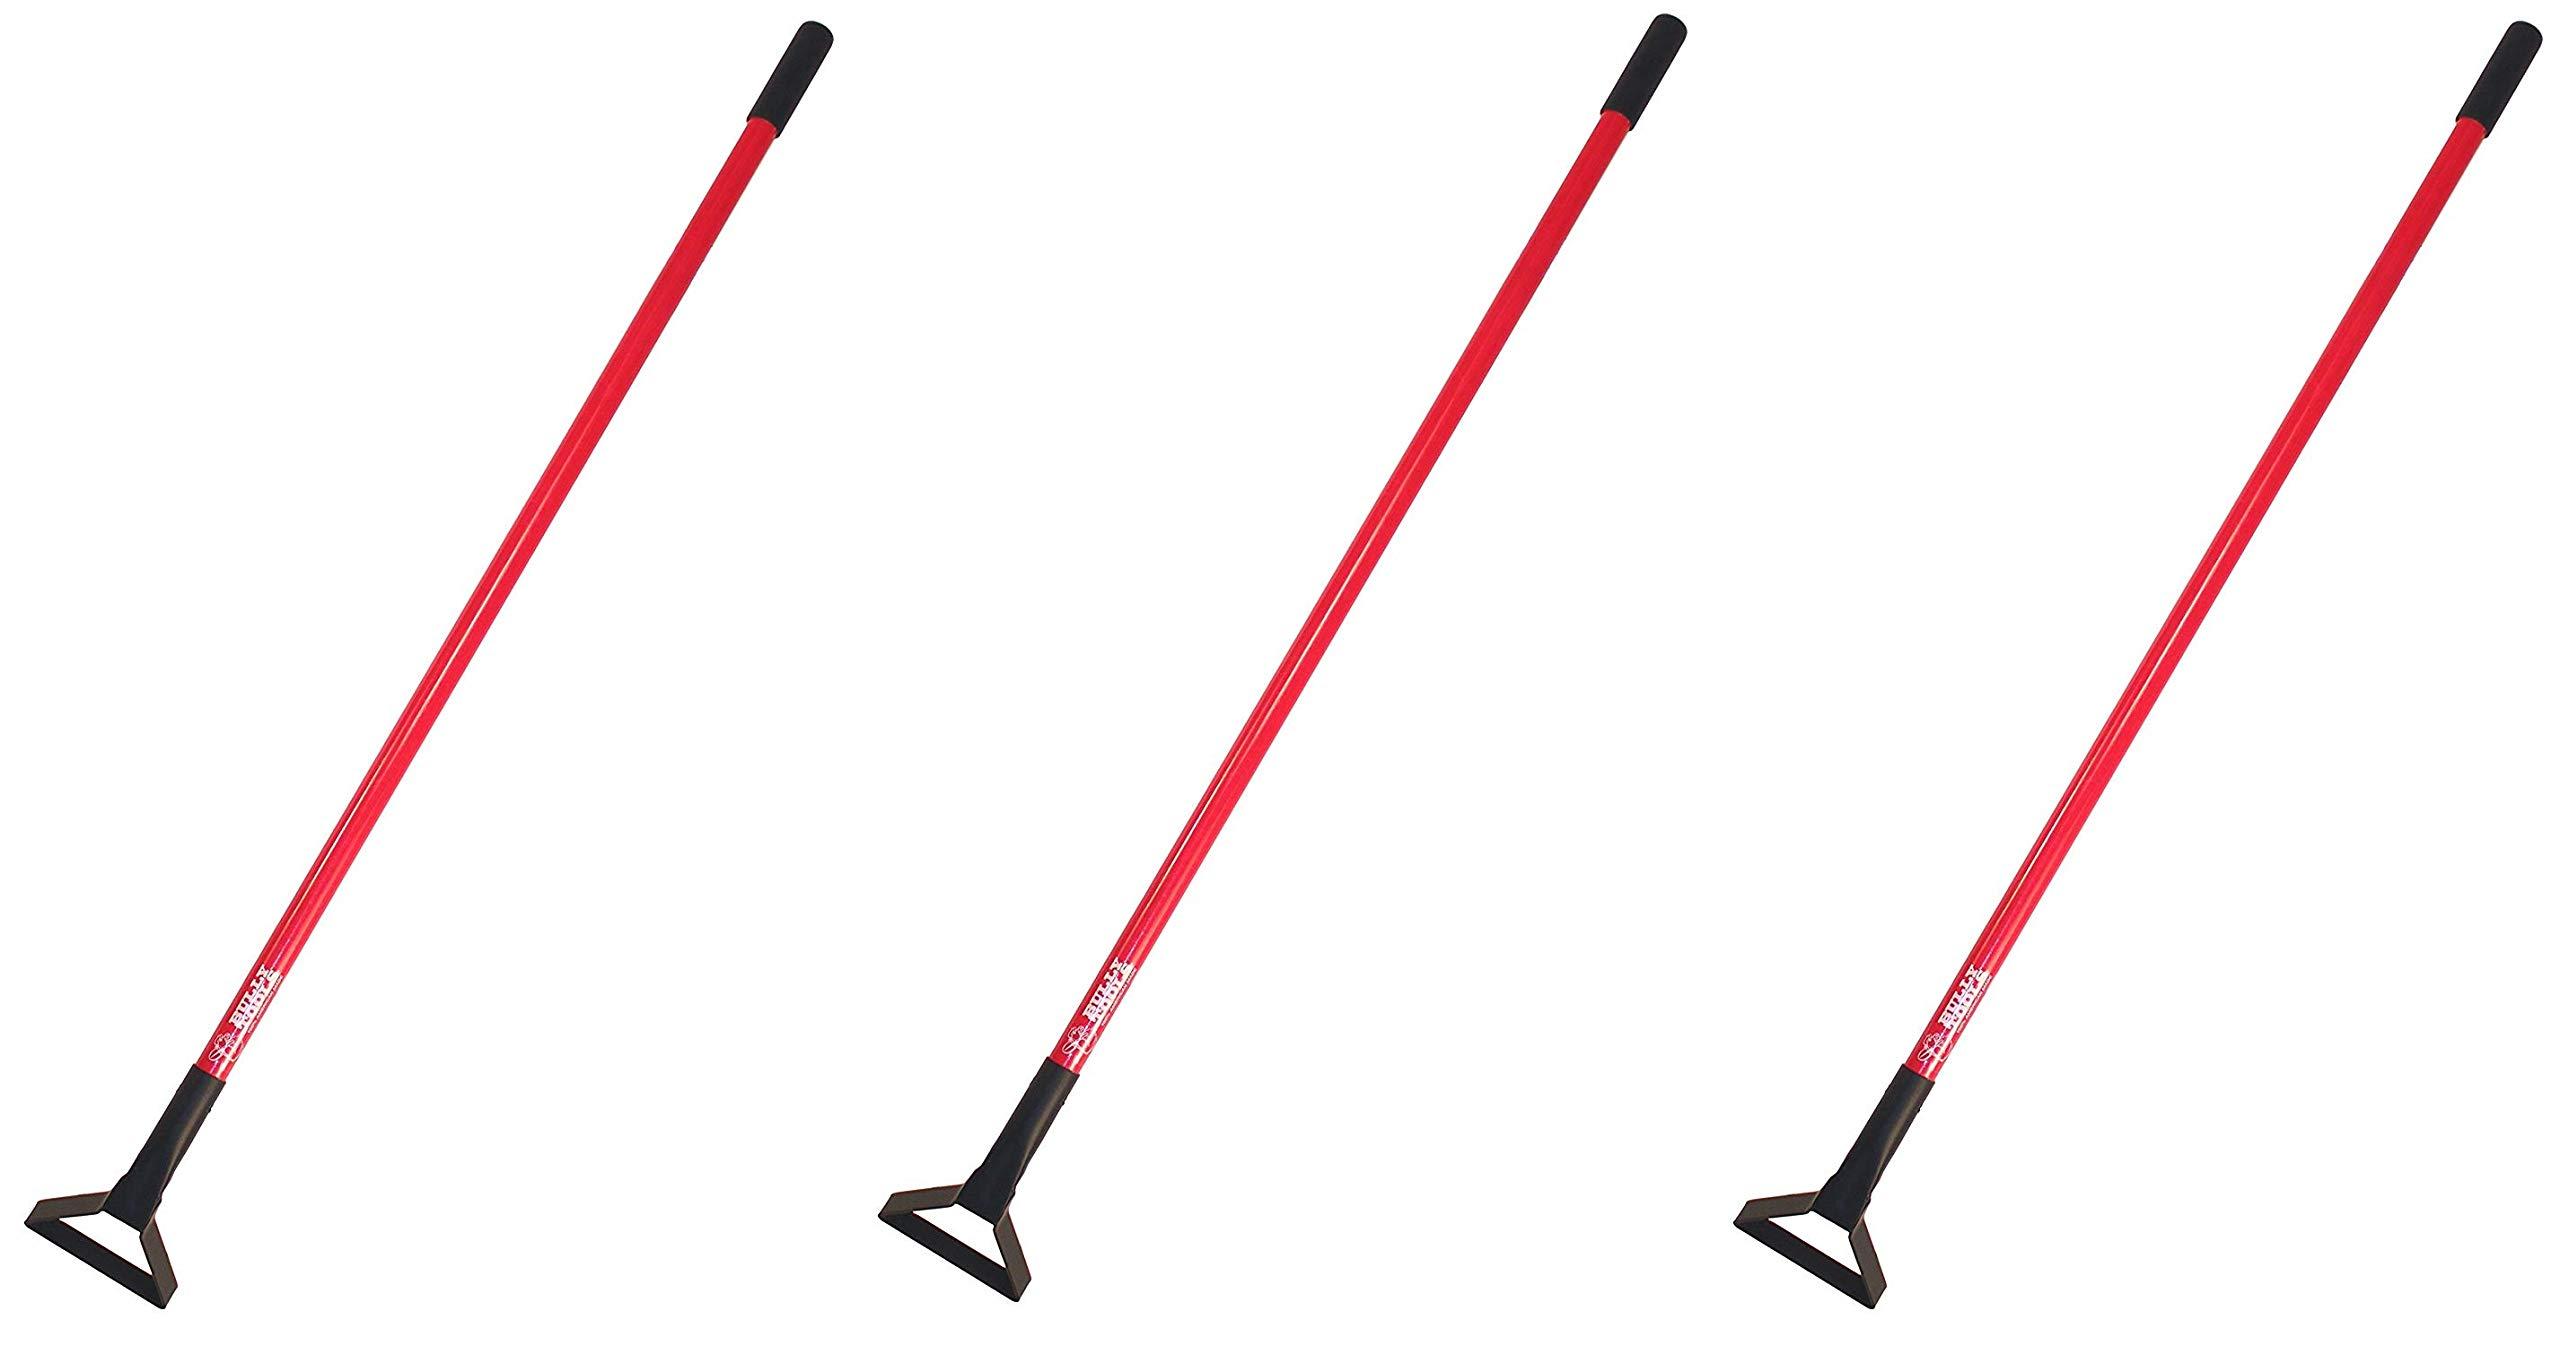 Bully Tools 92348 12-Gauge Loop Hoe with Fiberglass Handle, Pack of 1 (Тhrее Pаck)